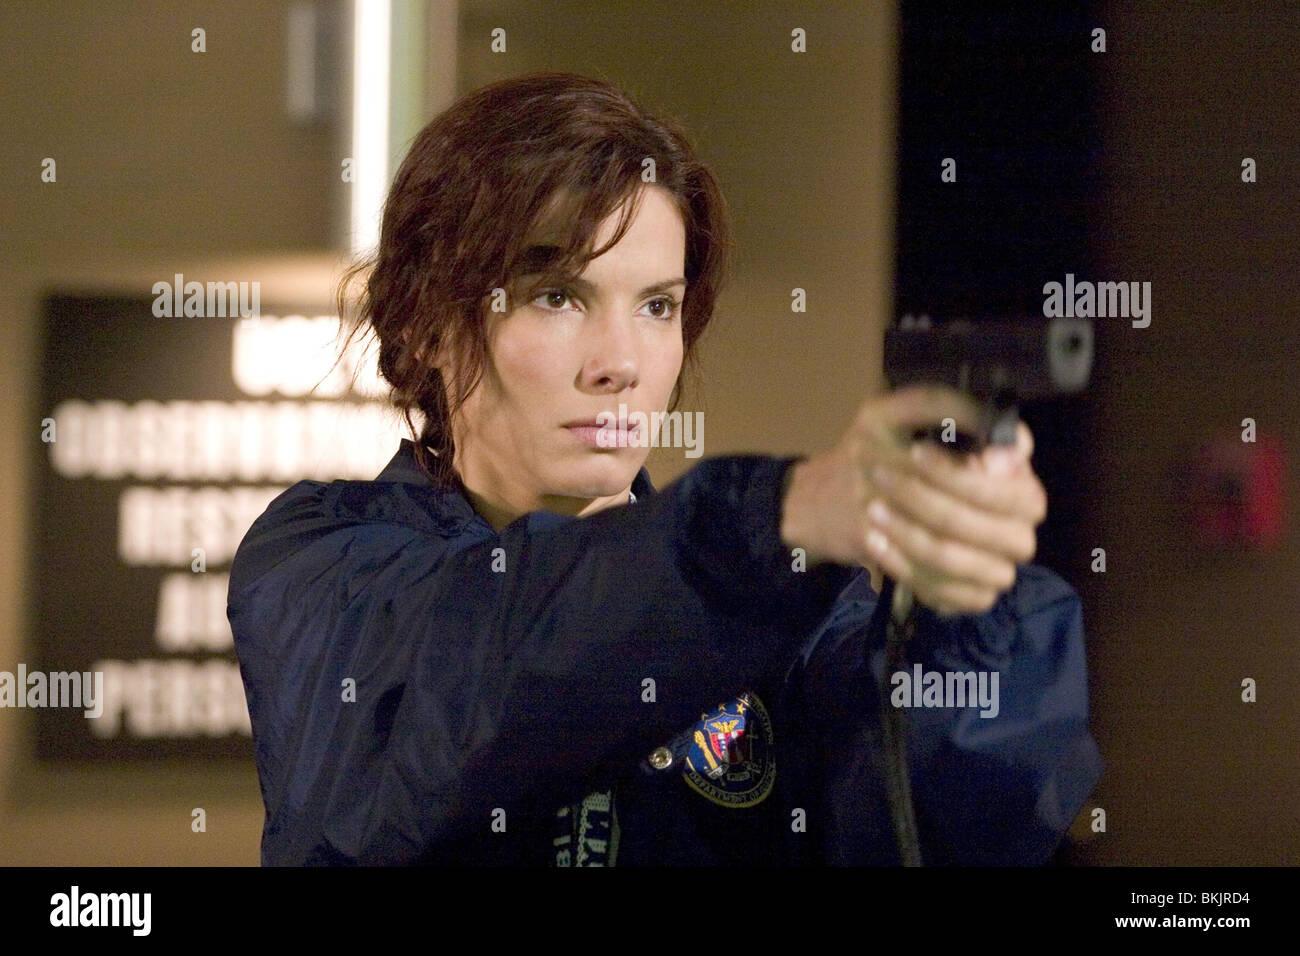 MISS UNDERCOVER 2: BEWAFFNET UND FABELHAFTE (2005) SANDRA BULLOCK MSC2 001-13 Stockbild